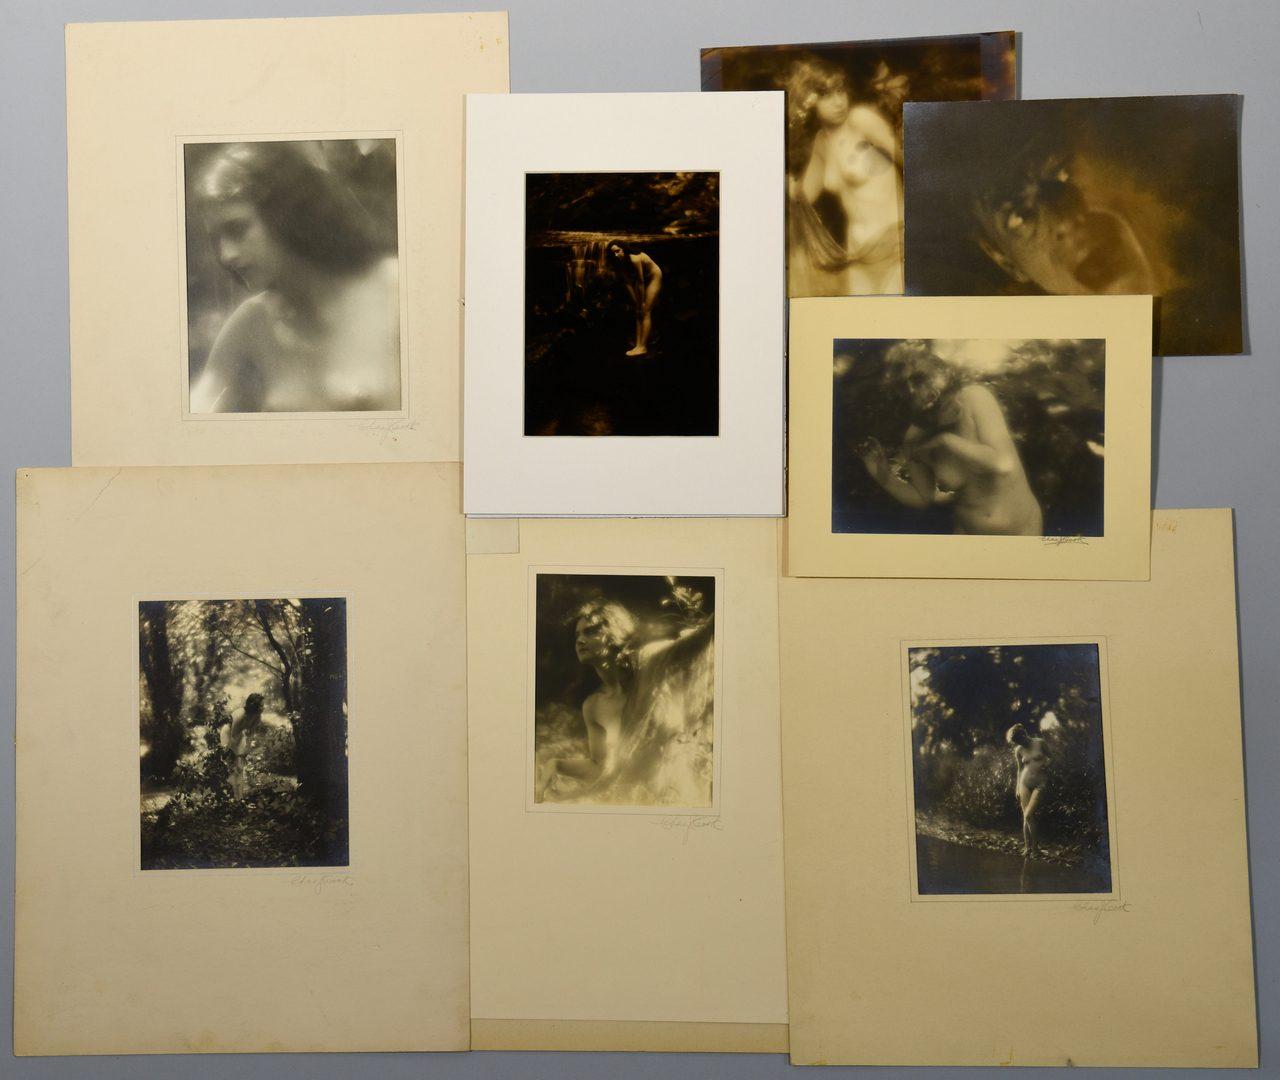 Lot 761: 8 Charlie Cook photographs inc. orotone